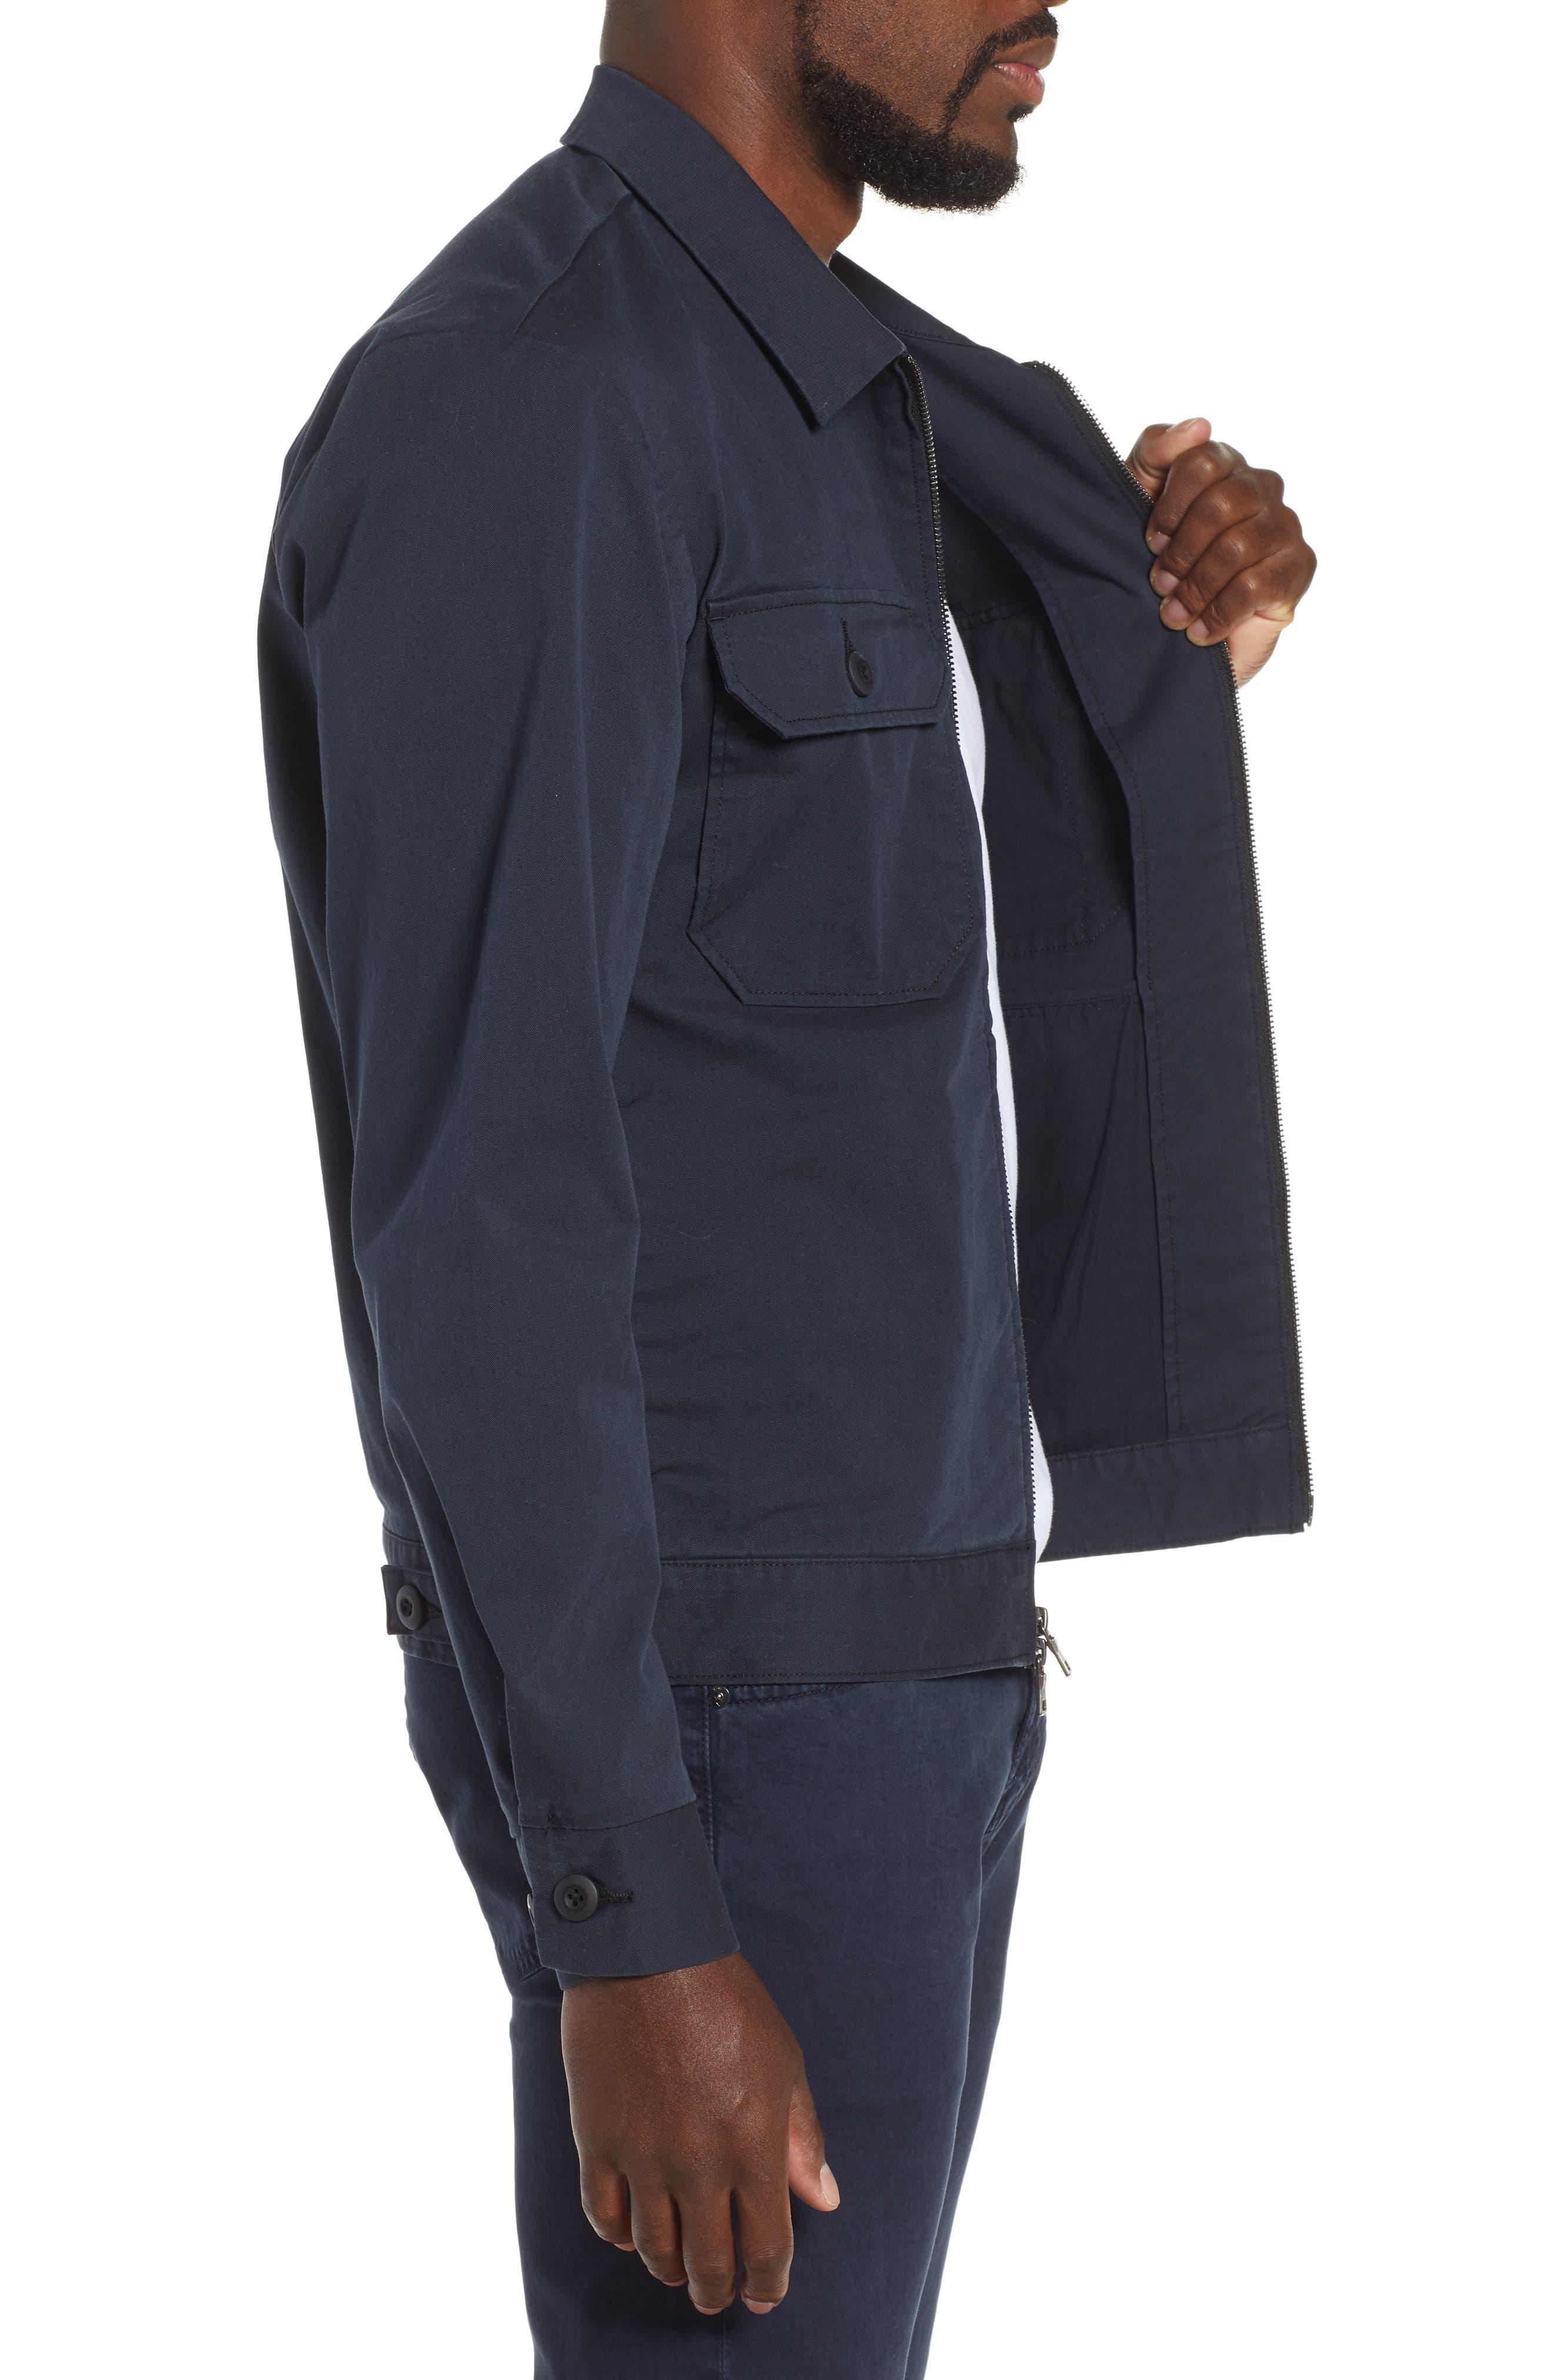 Axle Shop Regular Stretch Cotton Blend Jacket,                             Alternate thumbnail 3, color,                             BLUE VAULT/ BLACK